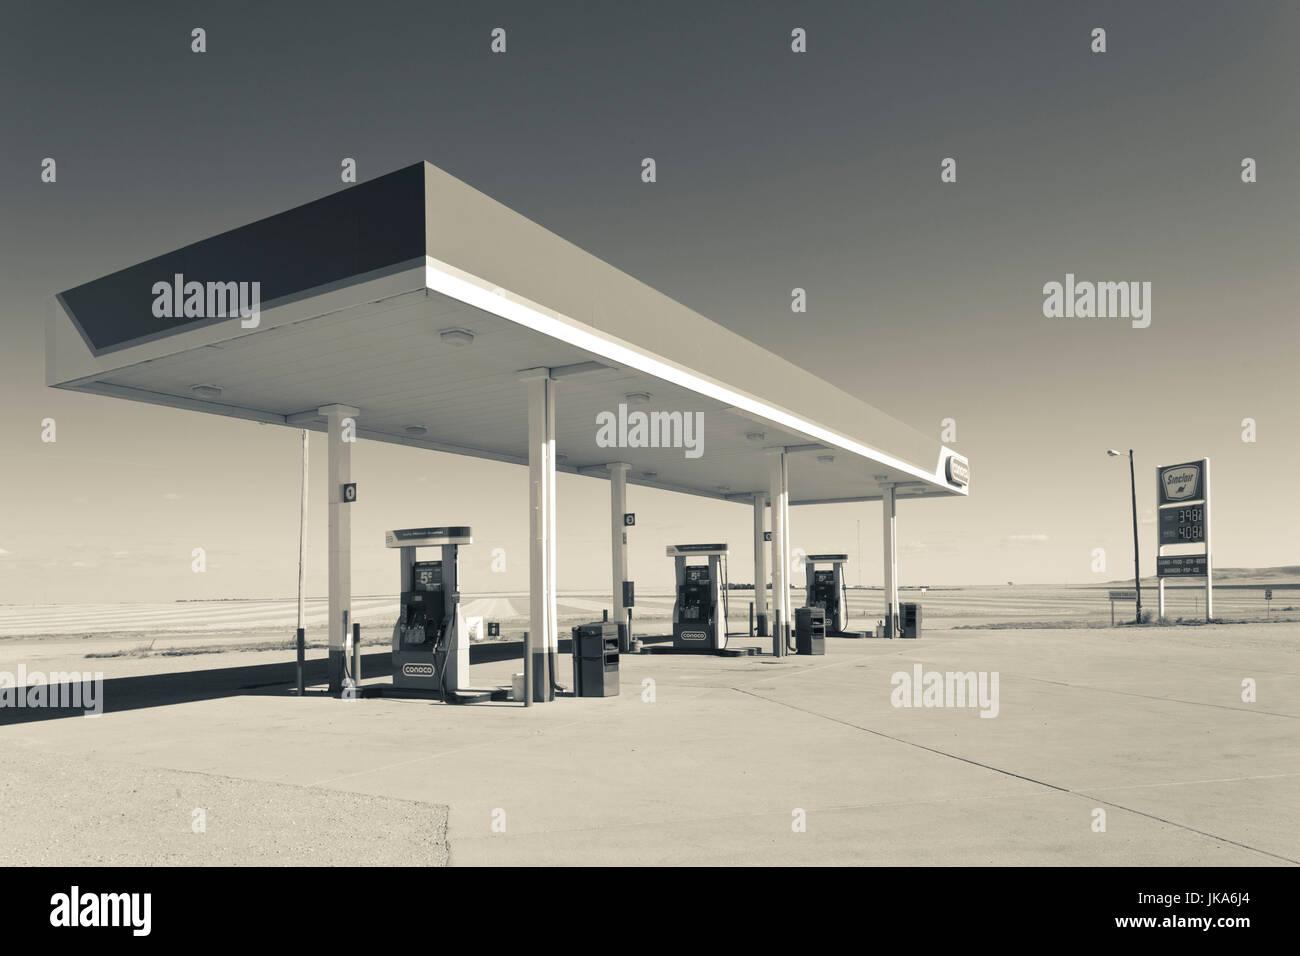 USA, South Dakota, Selby, gas station - Stock Image